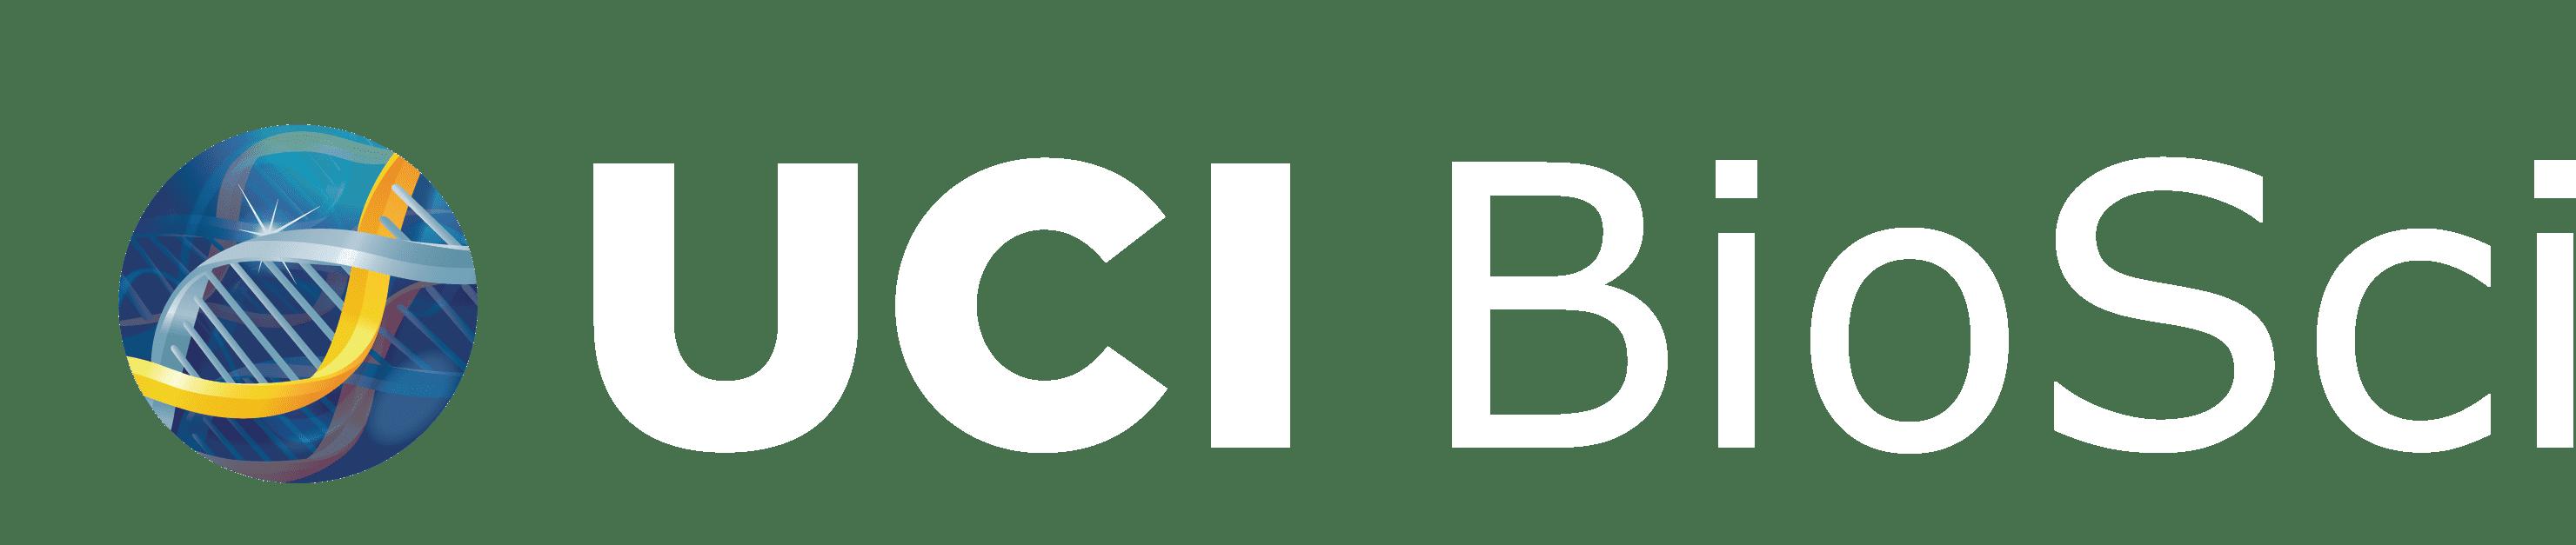 UCI BioSci logo white